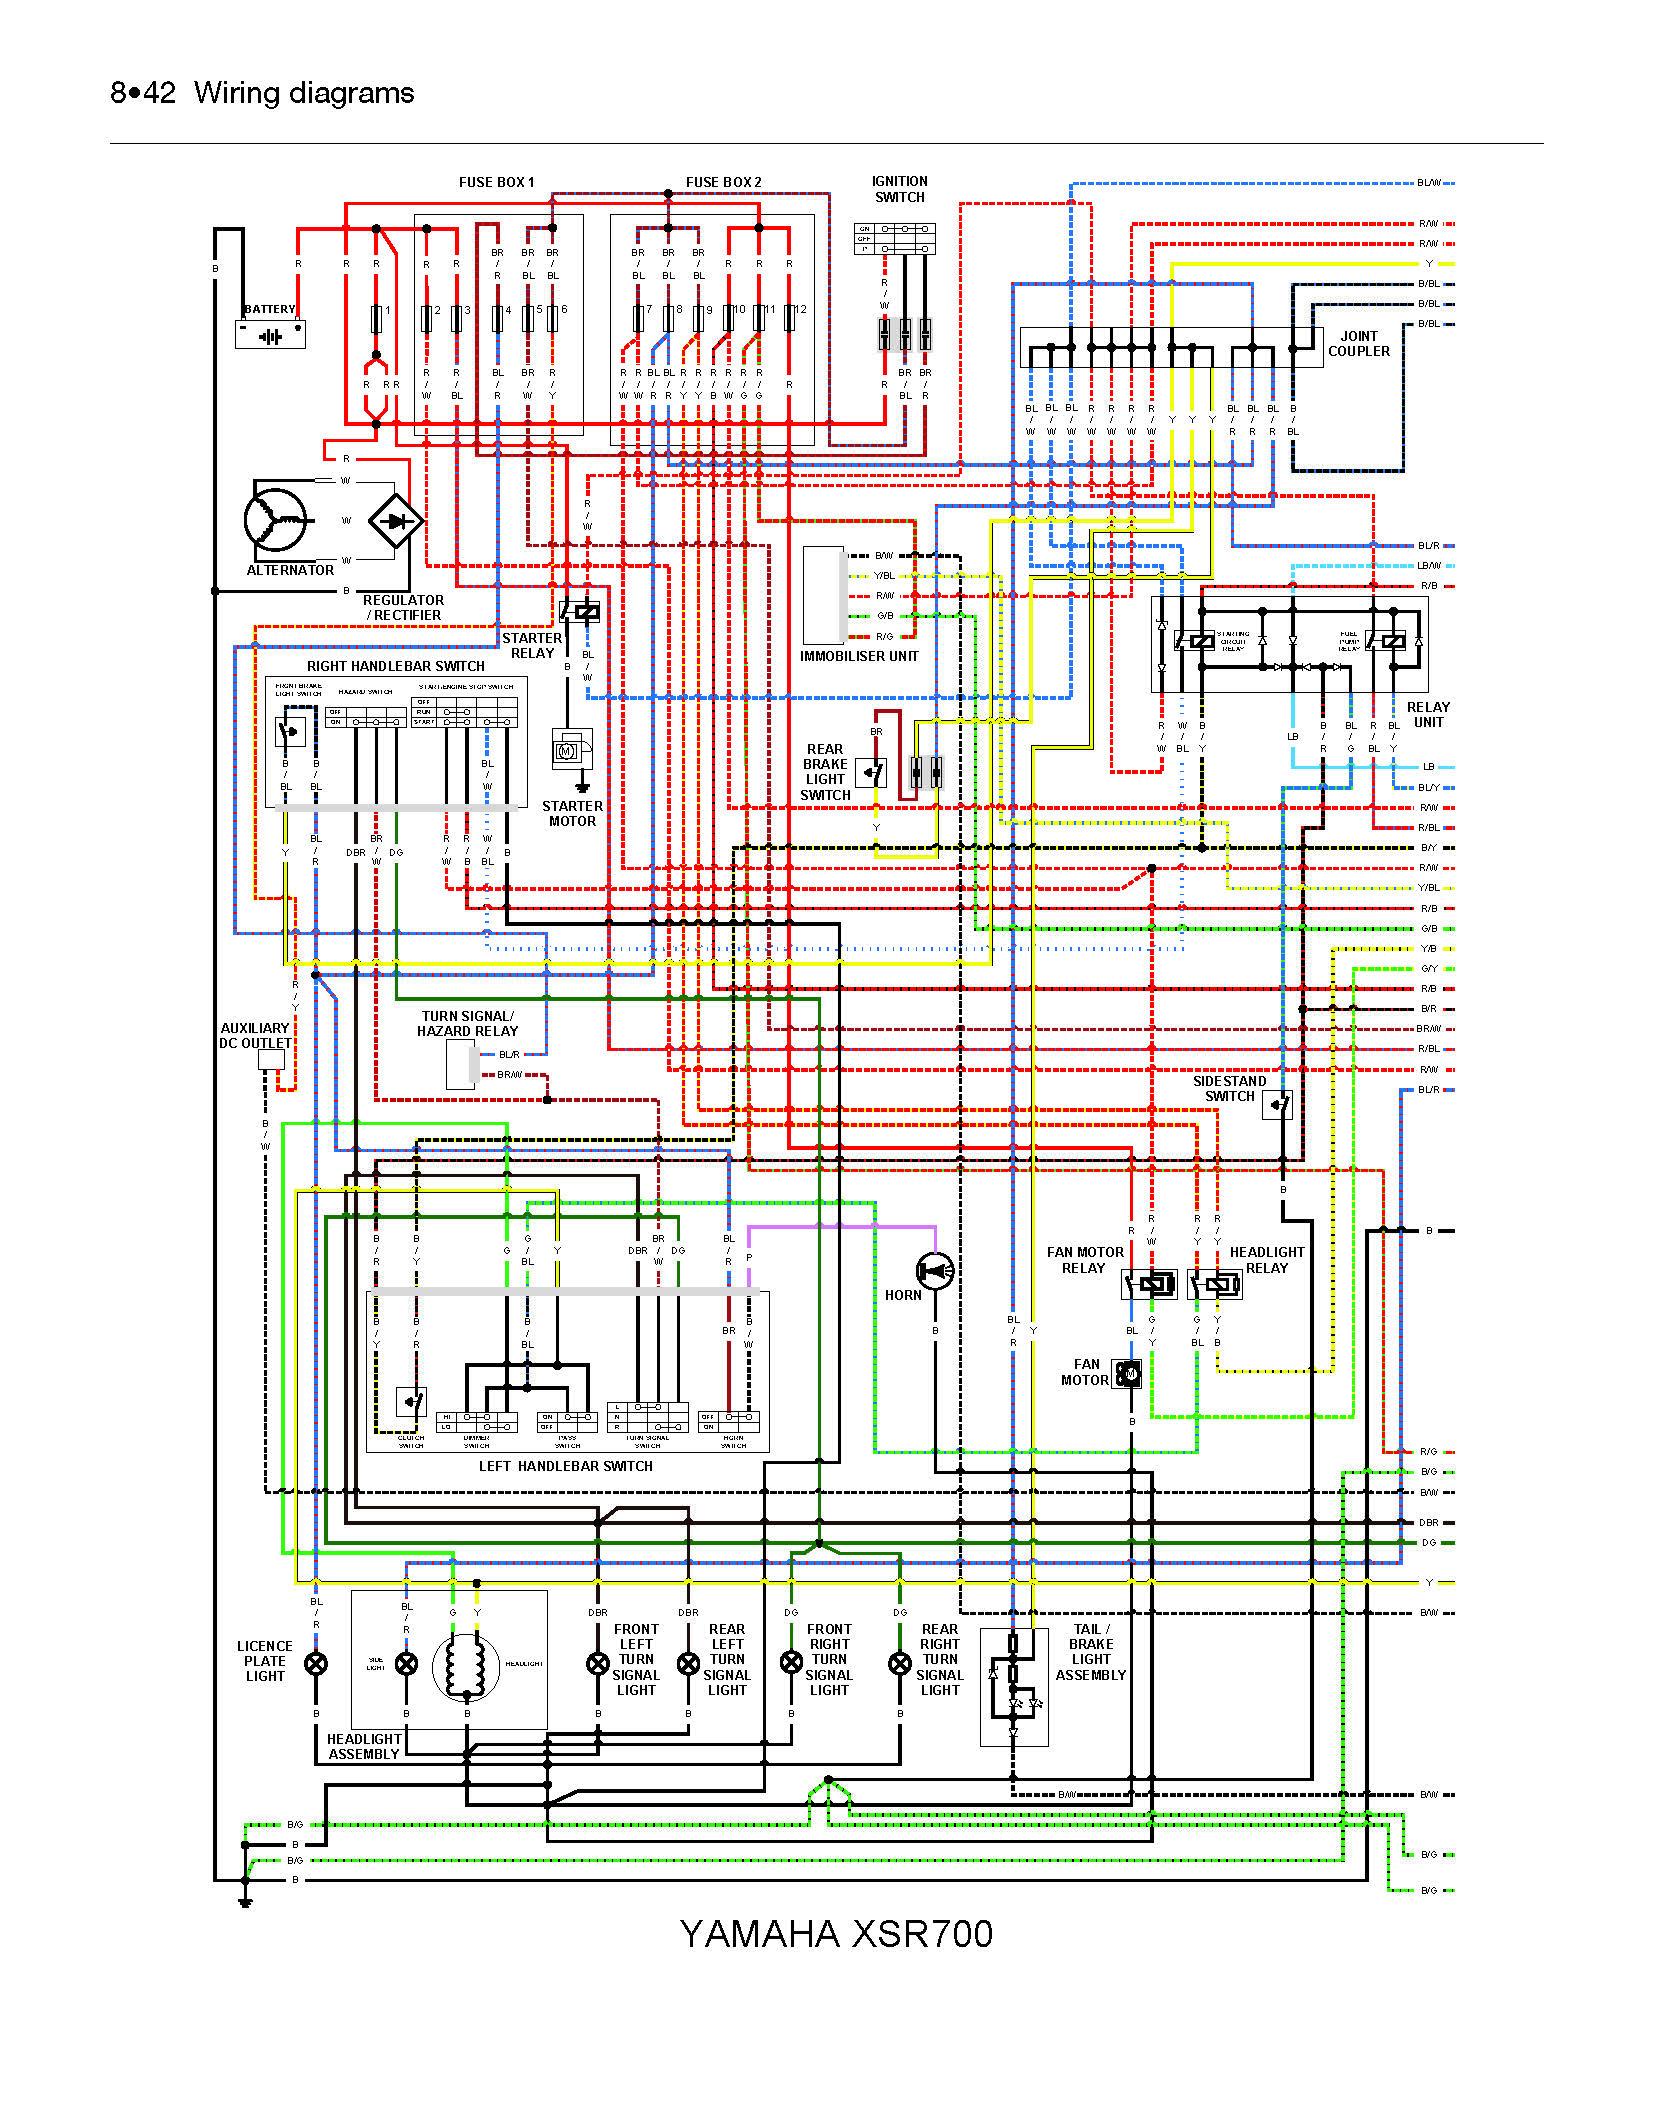 an_3886] yamaha sz wiring diagram 2014 yamaha fz6 wiring diagram  lexor indi exmet inst piot cali xeira mohammedshrine librar wiring 101